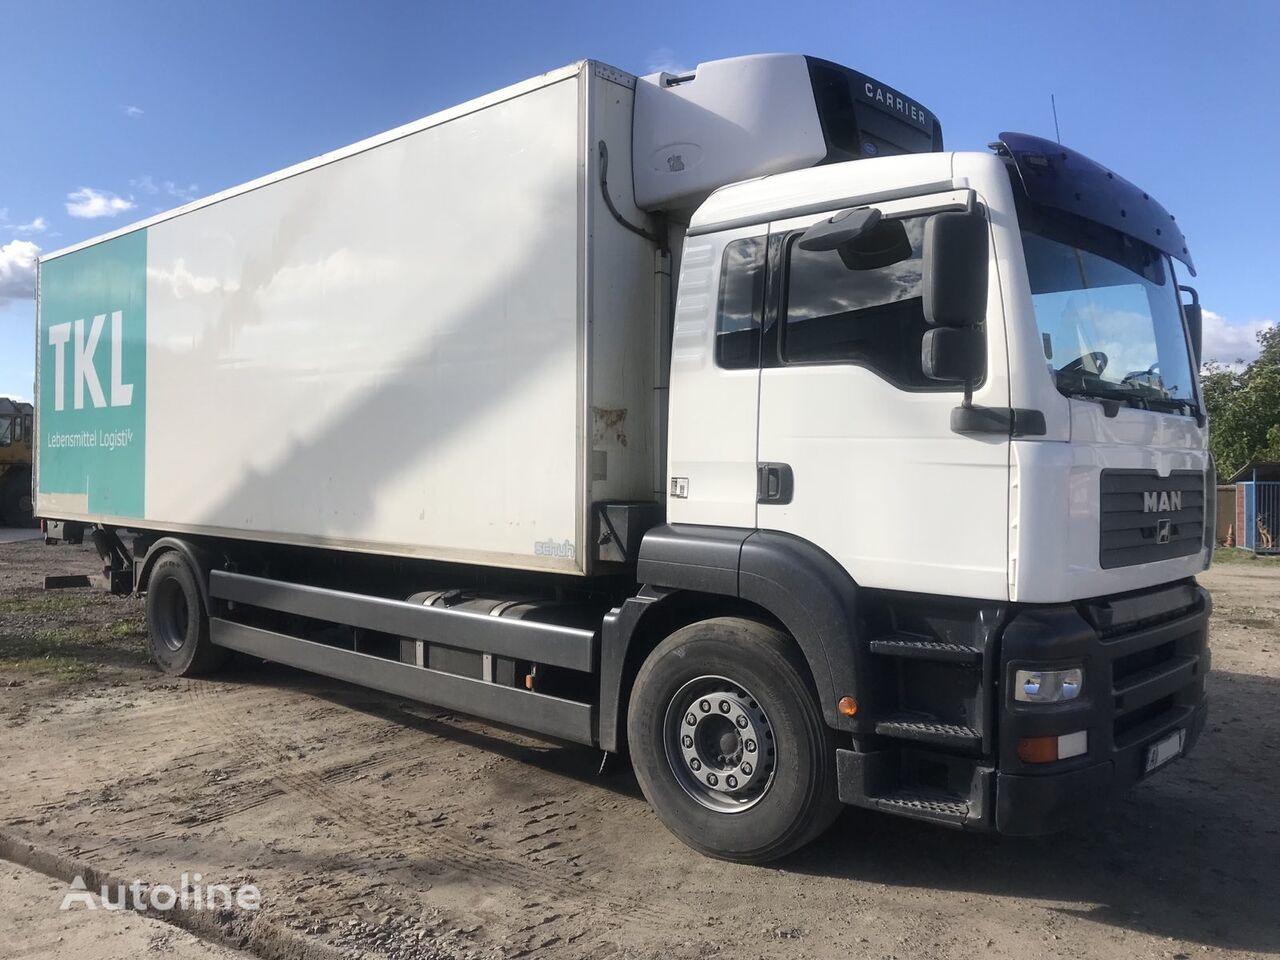 MAN TGA 18.310 Refrizherator Carrier -30 45m Povne pnevmo! camión frigorífico